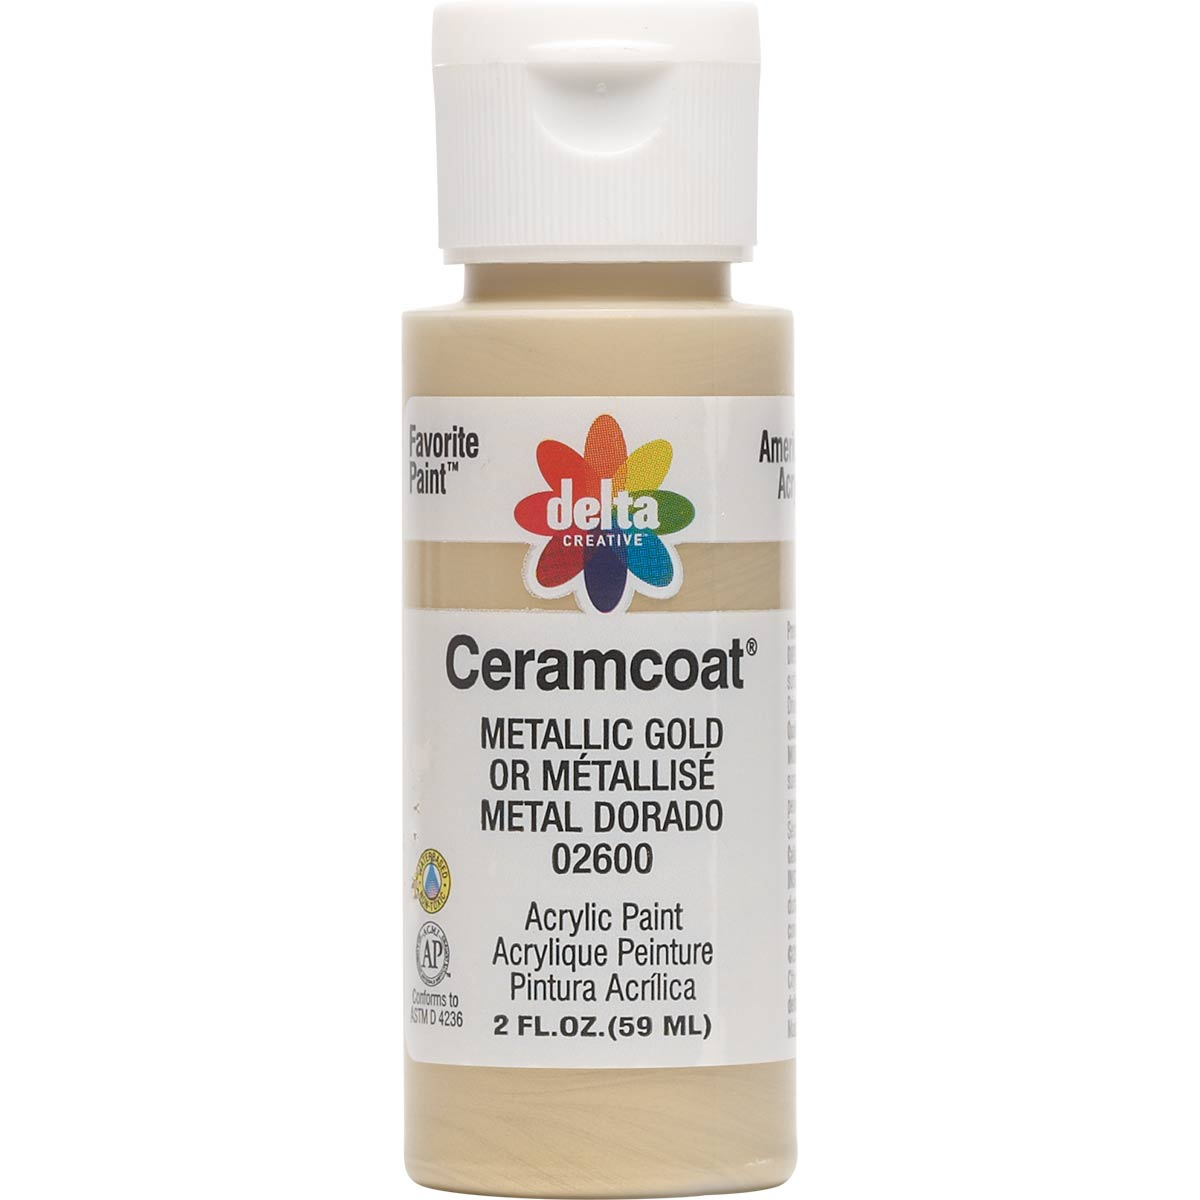 Delta Ceramcoat ® Acrylic Paint - Metallic Gold, 2 oz. - 026000202W